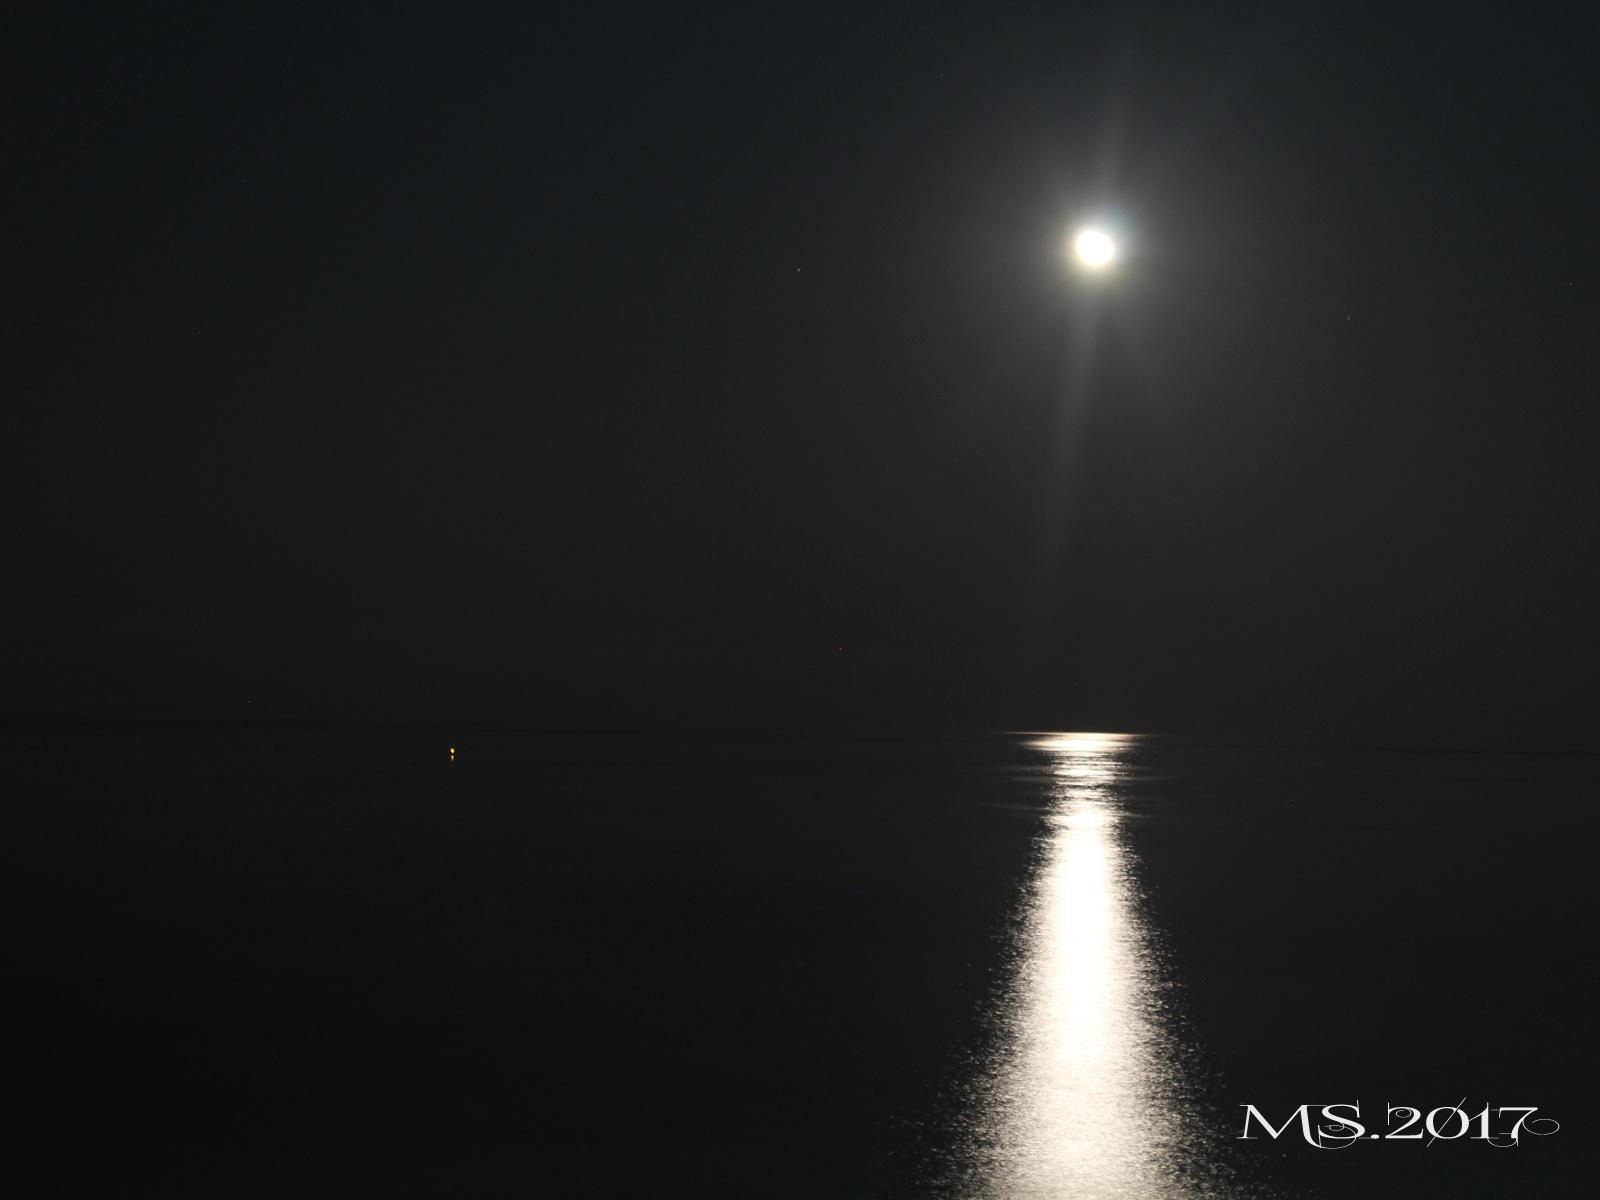 [FOTOGRAFIA] – E la luna bussò